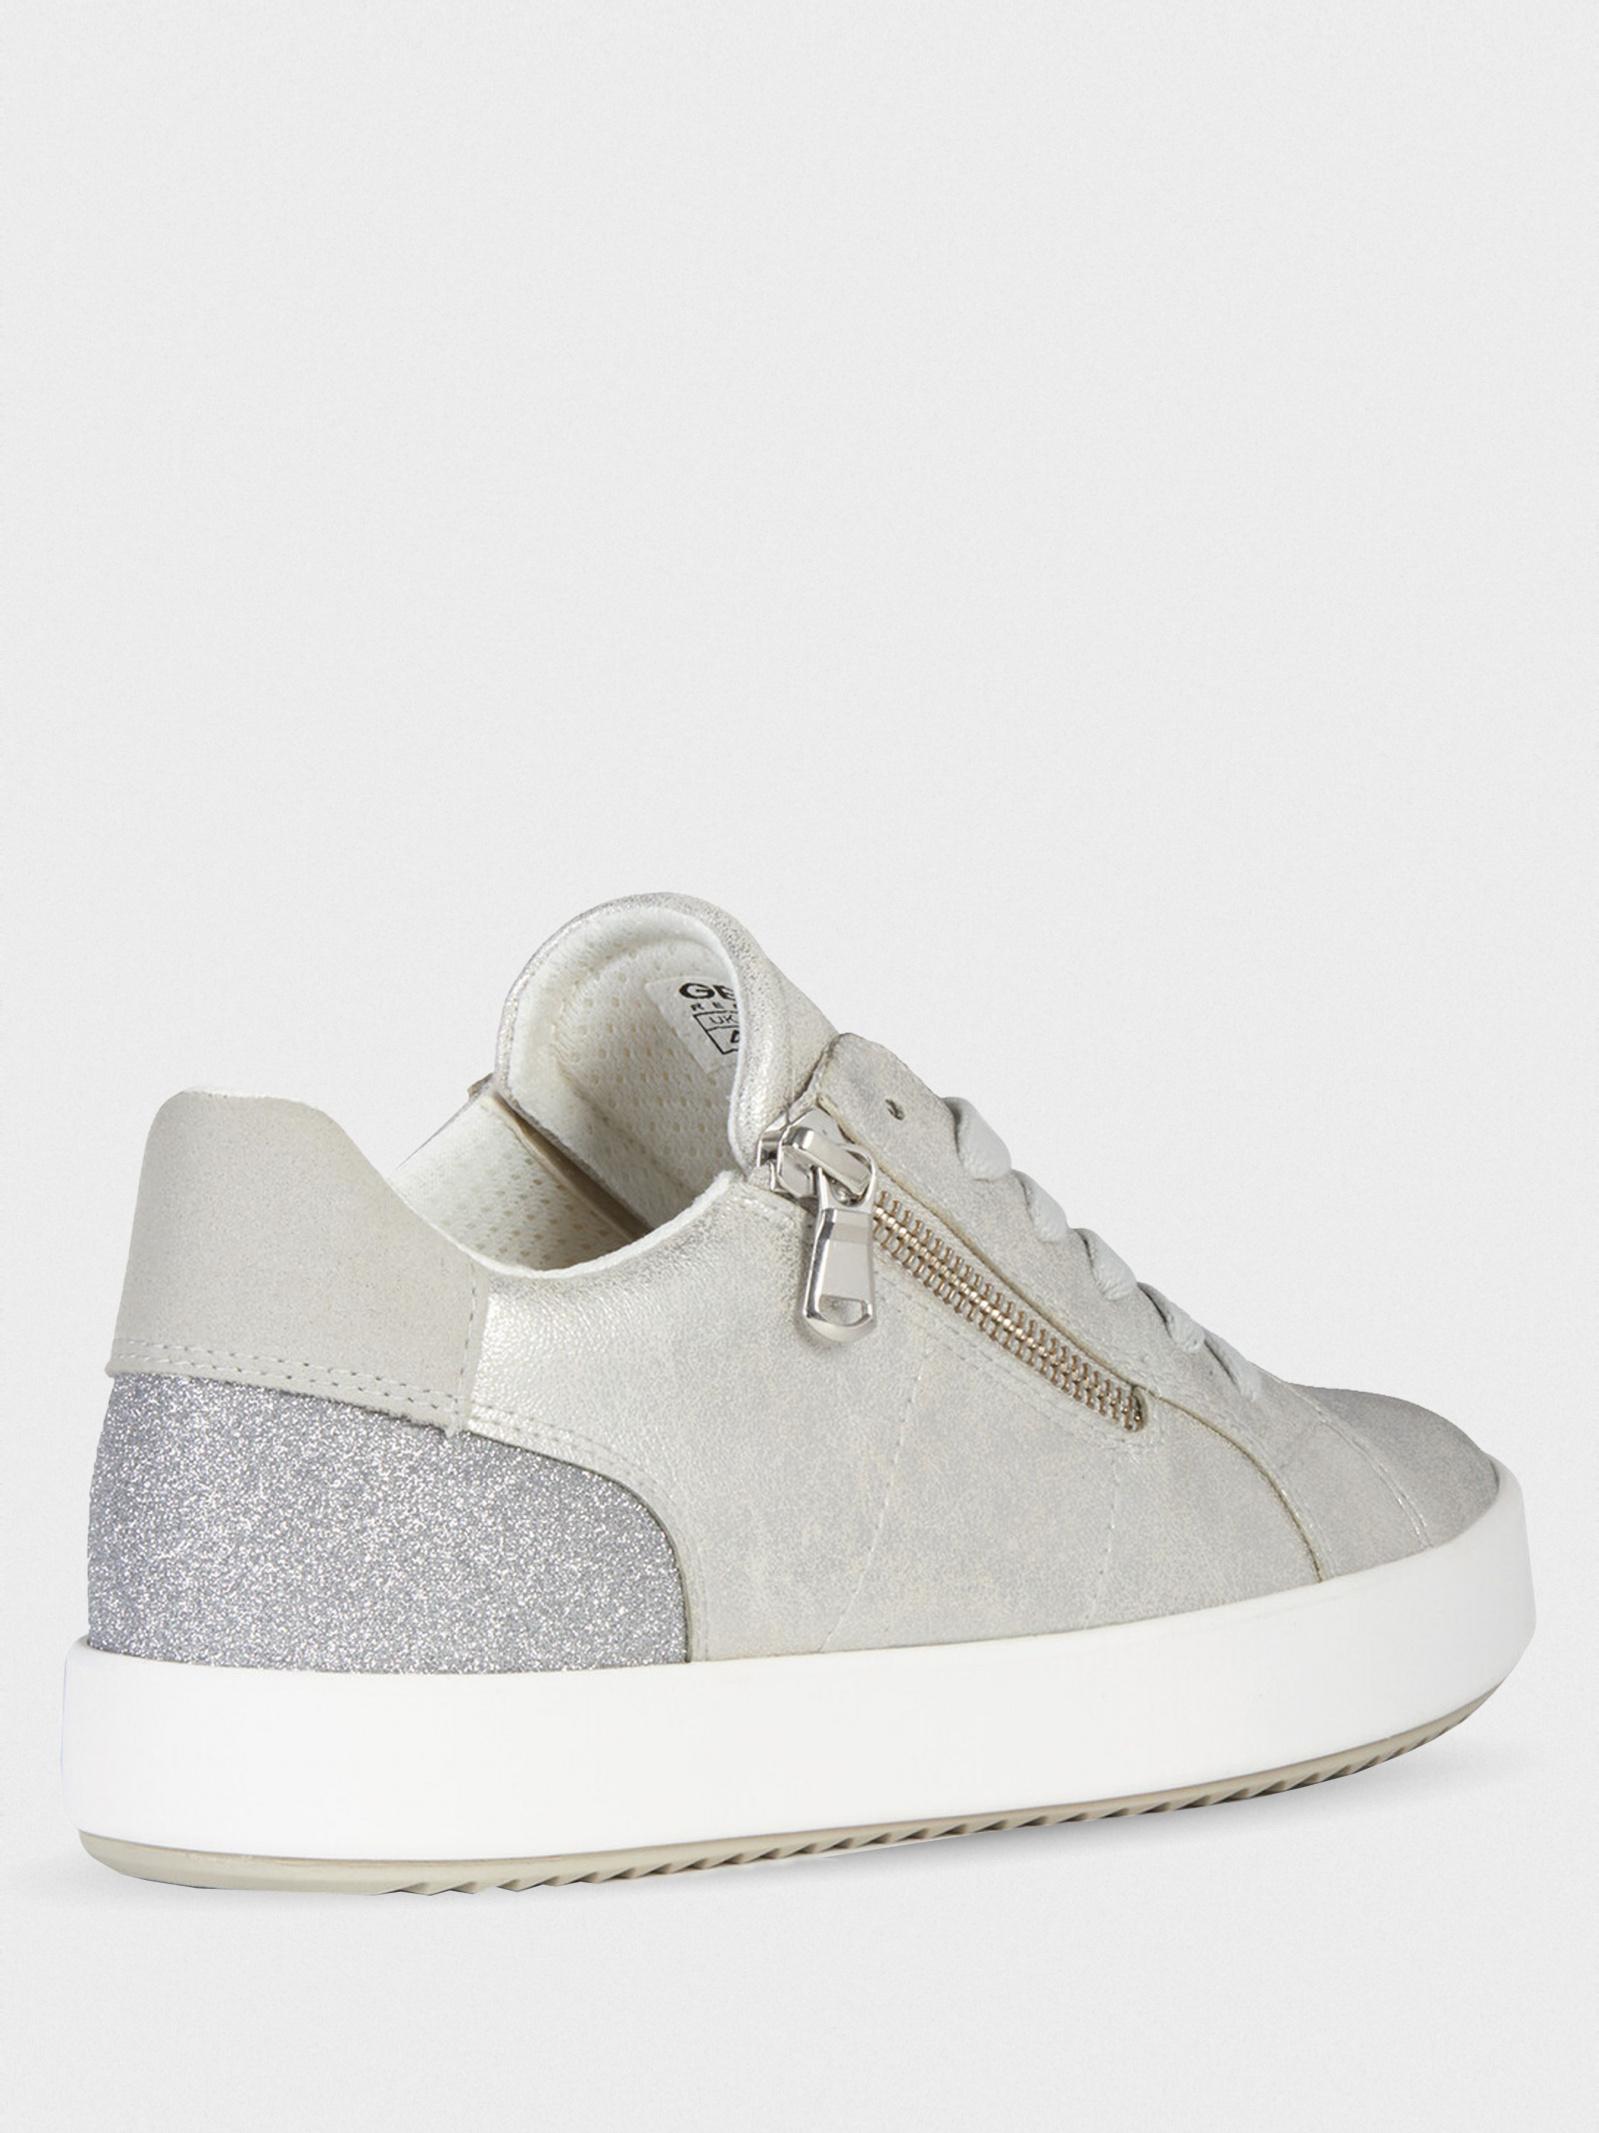 Полуботинки женские Geox D BLOMIEE XW3786 размеры обуви, 2017